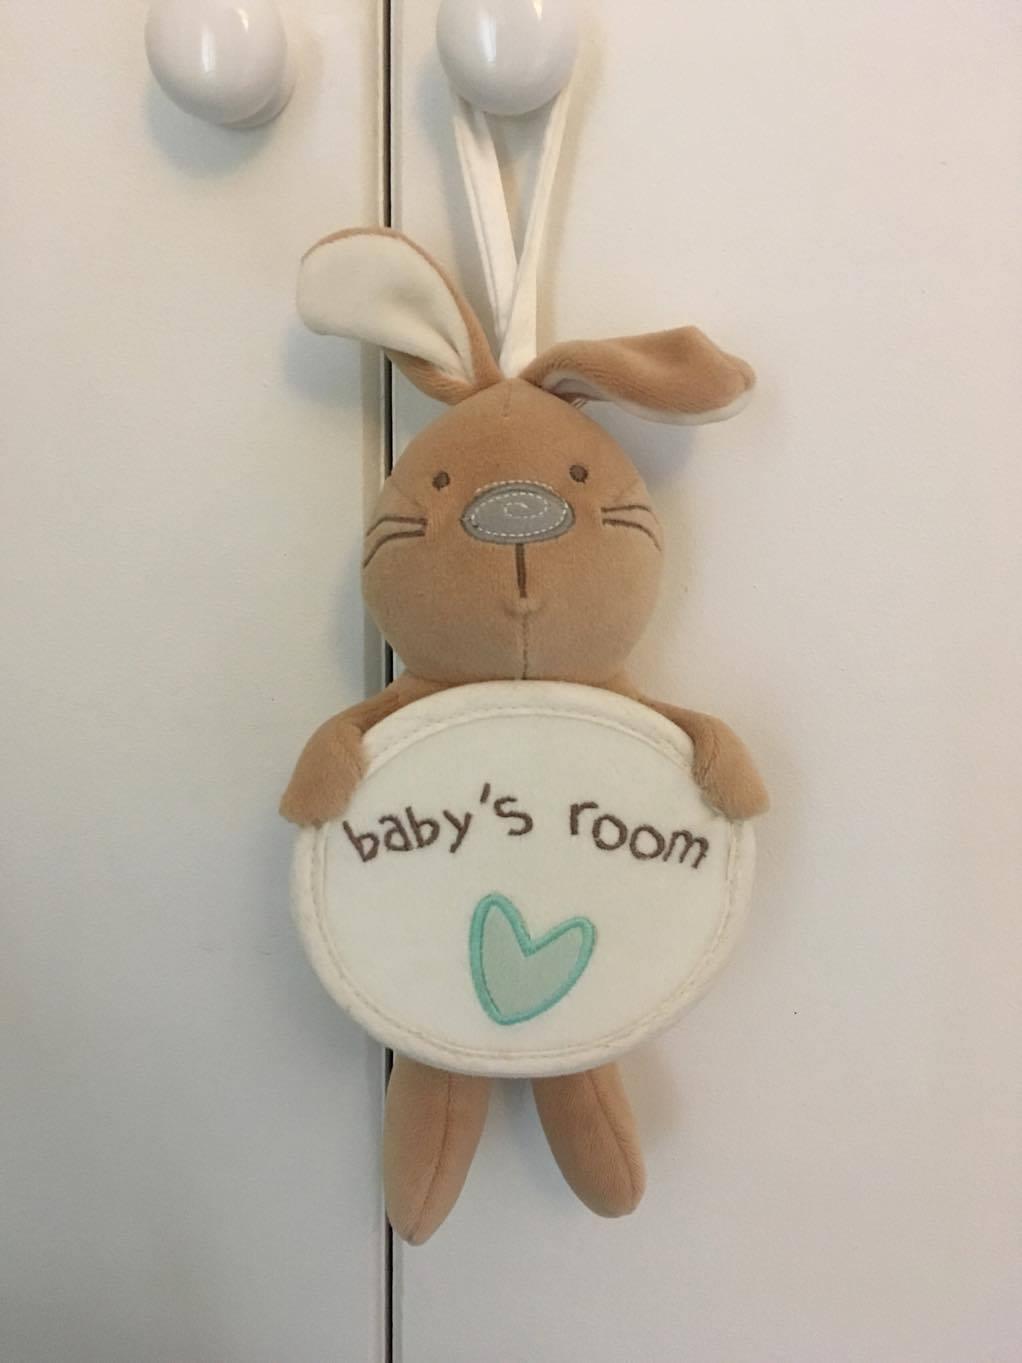 baby's room toy